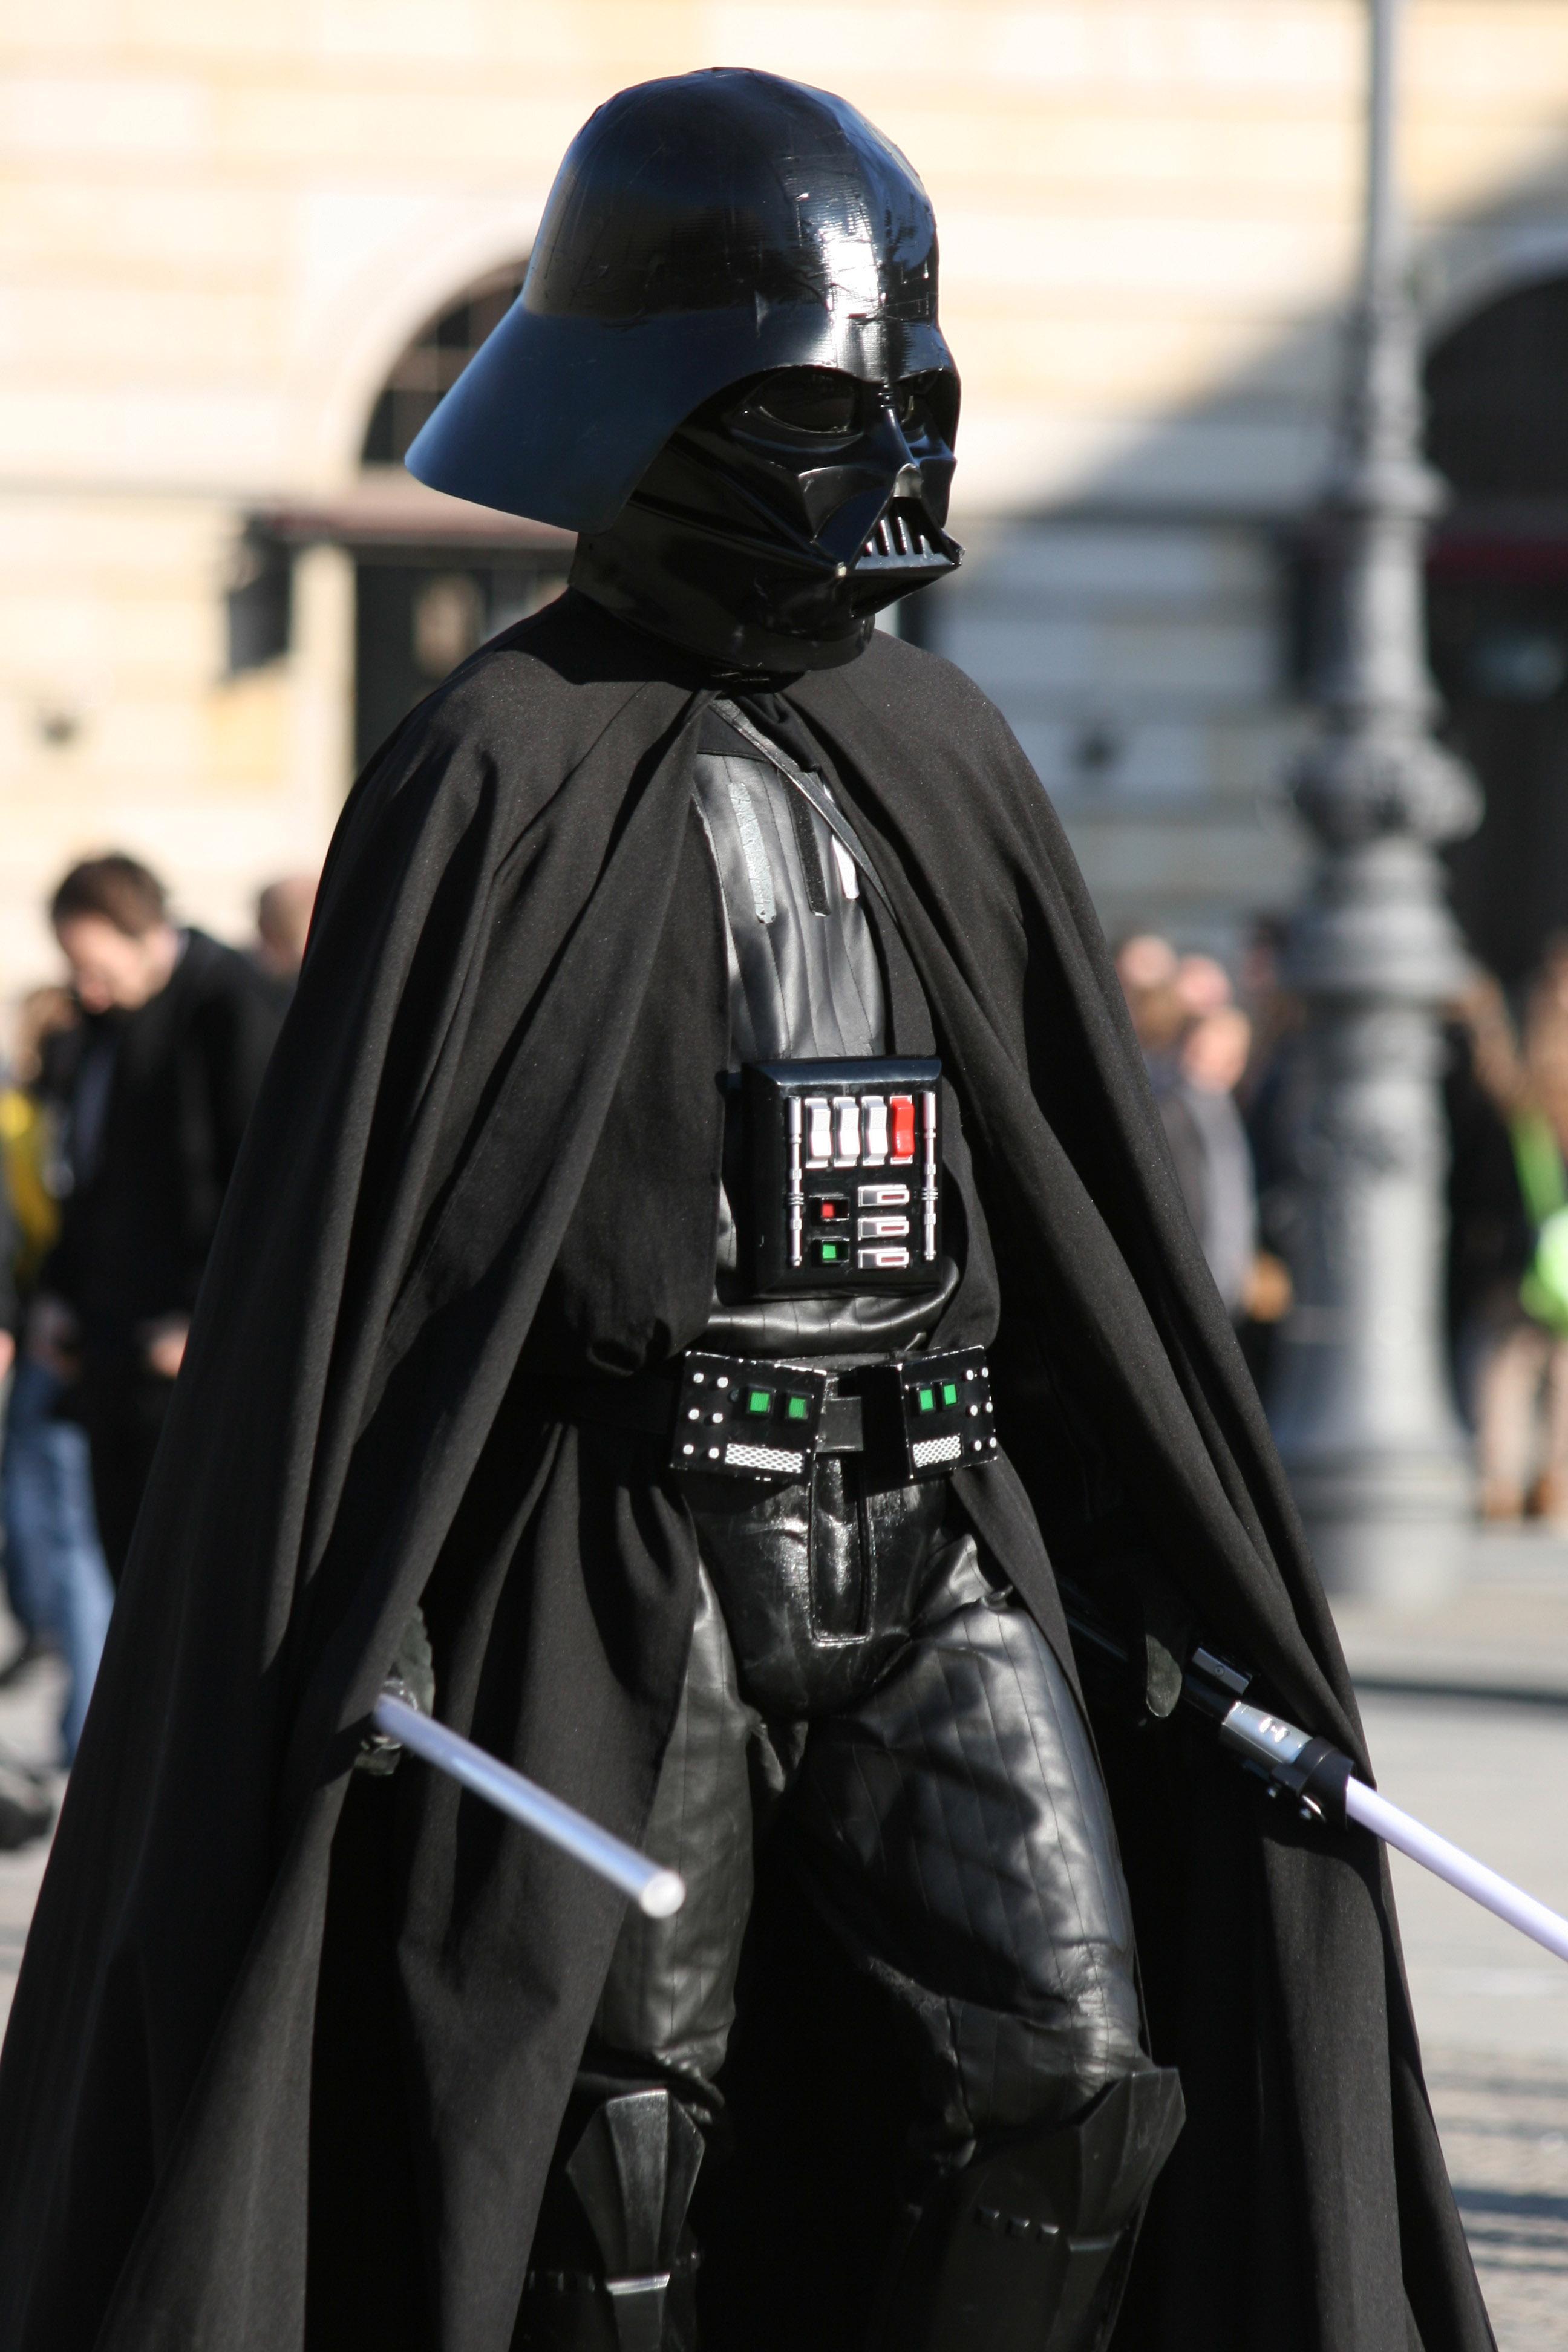 A street performer dressed as Darth Vader in front of the Brandbenburg Gate (Brandenburger Tor) on Pariser Platz in Berlin